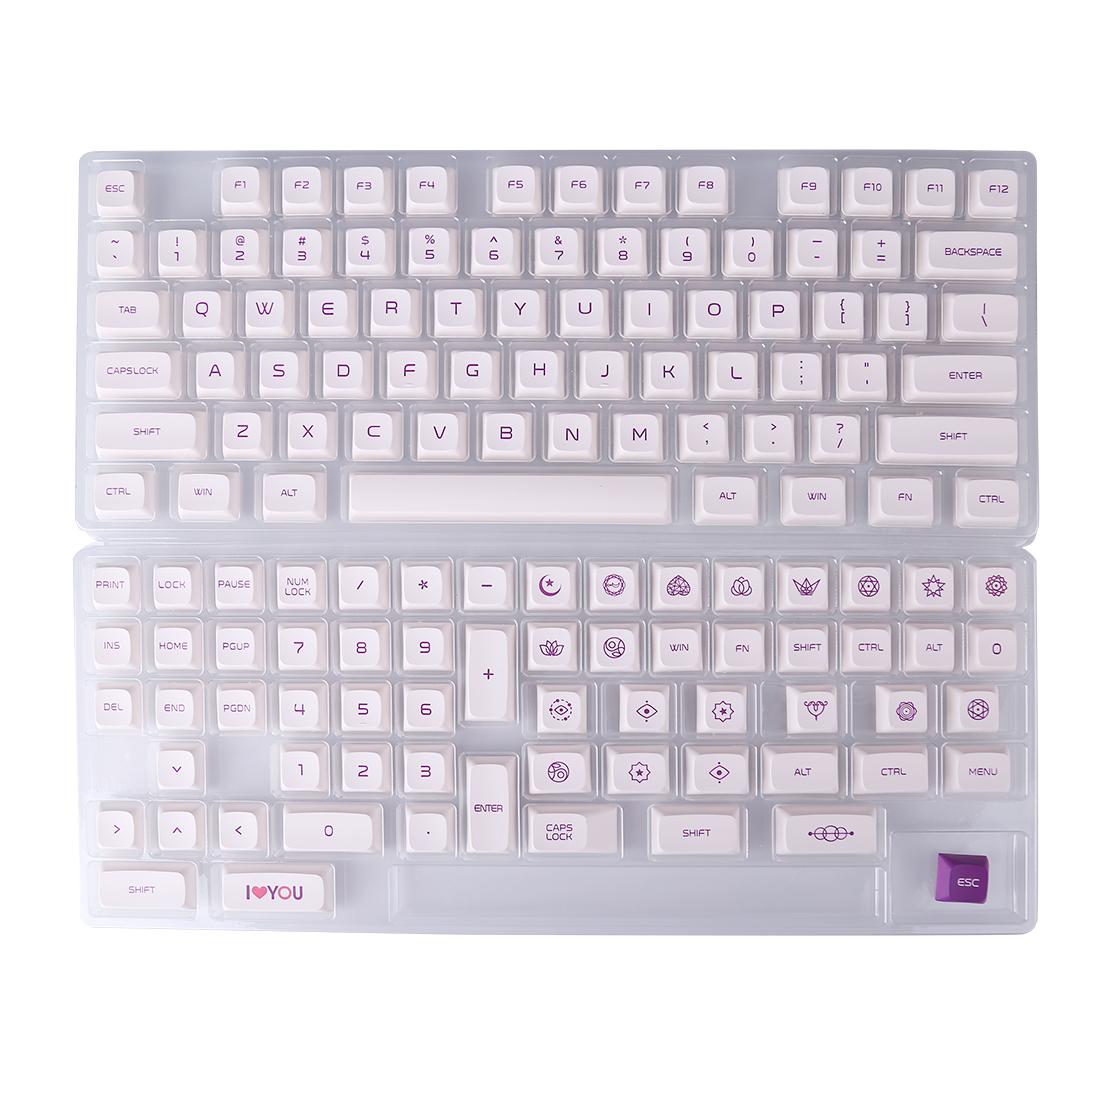 138pcs Milk White Keycaps Set PBT Dye-sub with Puller for 61/64/87/96/104 Keys GH60 /RK61 /Matrix /Joke Custom Gaming Mechanical Keyboard